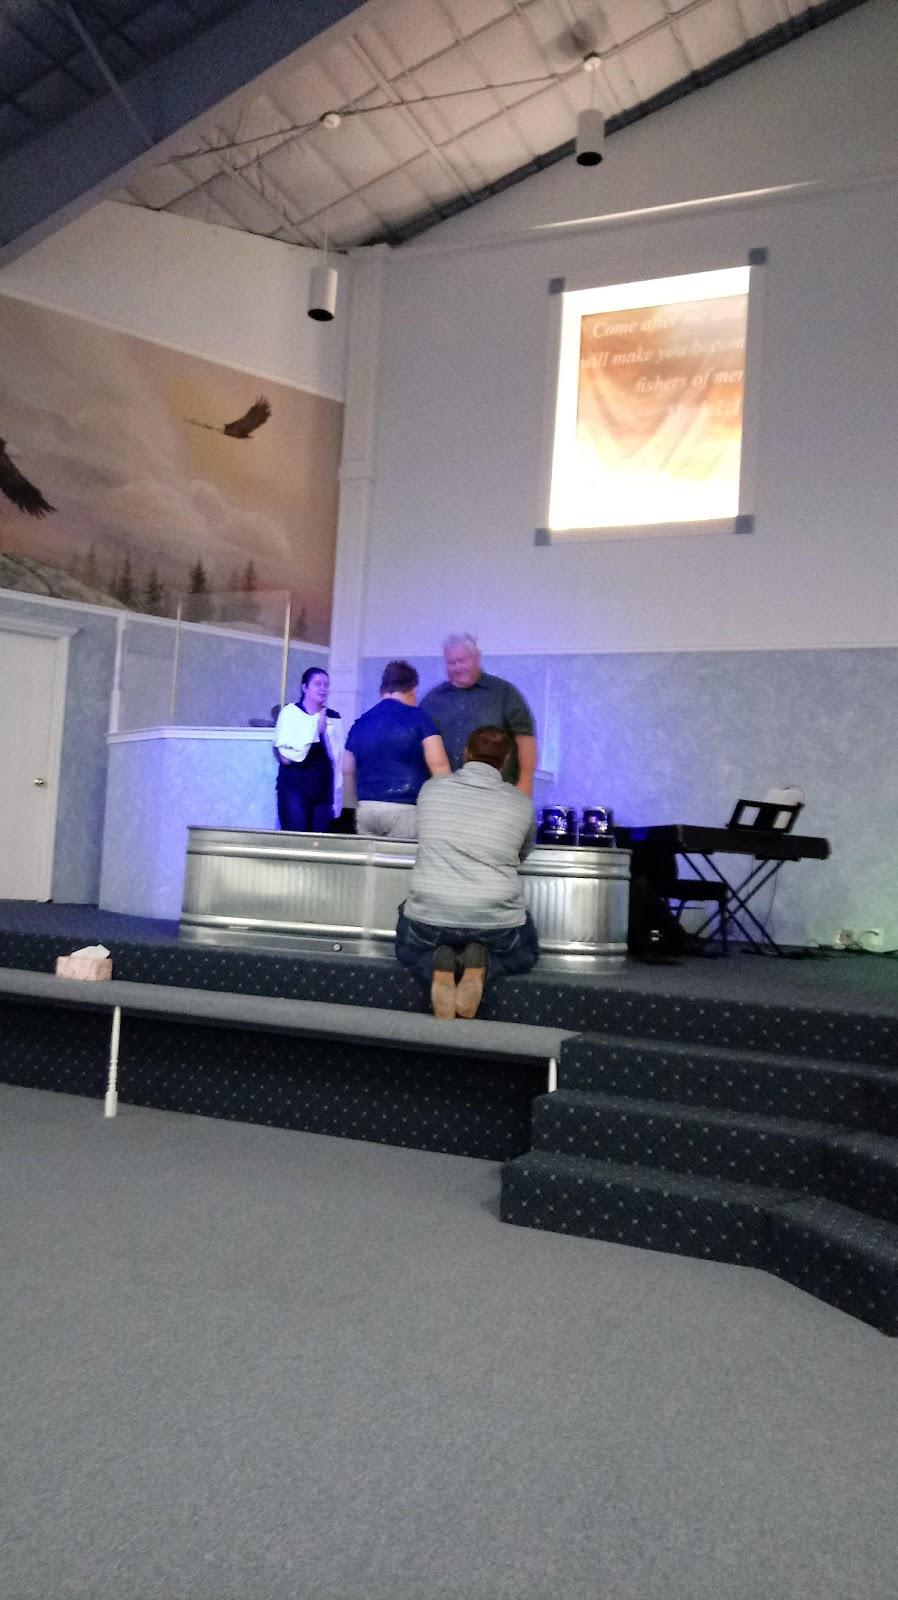 MVT Oasis Fellowship - church  | Photo 5 of 6 | Address: 113 FM115, Mt Vernon, TX 75457, USA | Phone: (903) 305-9966